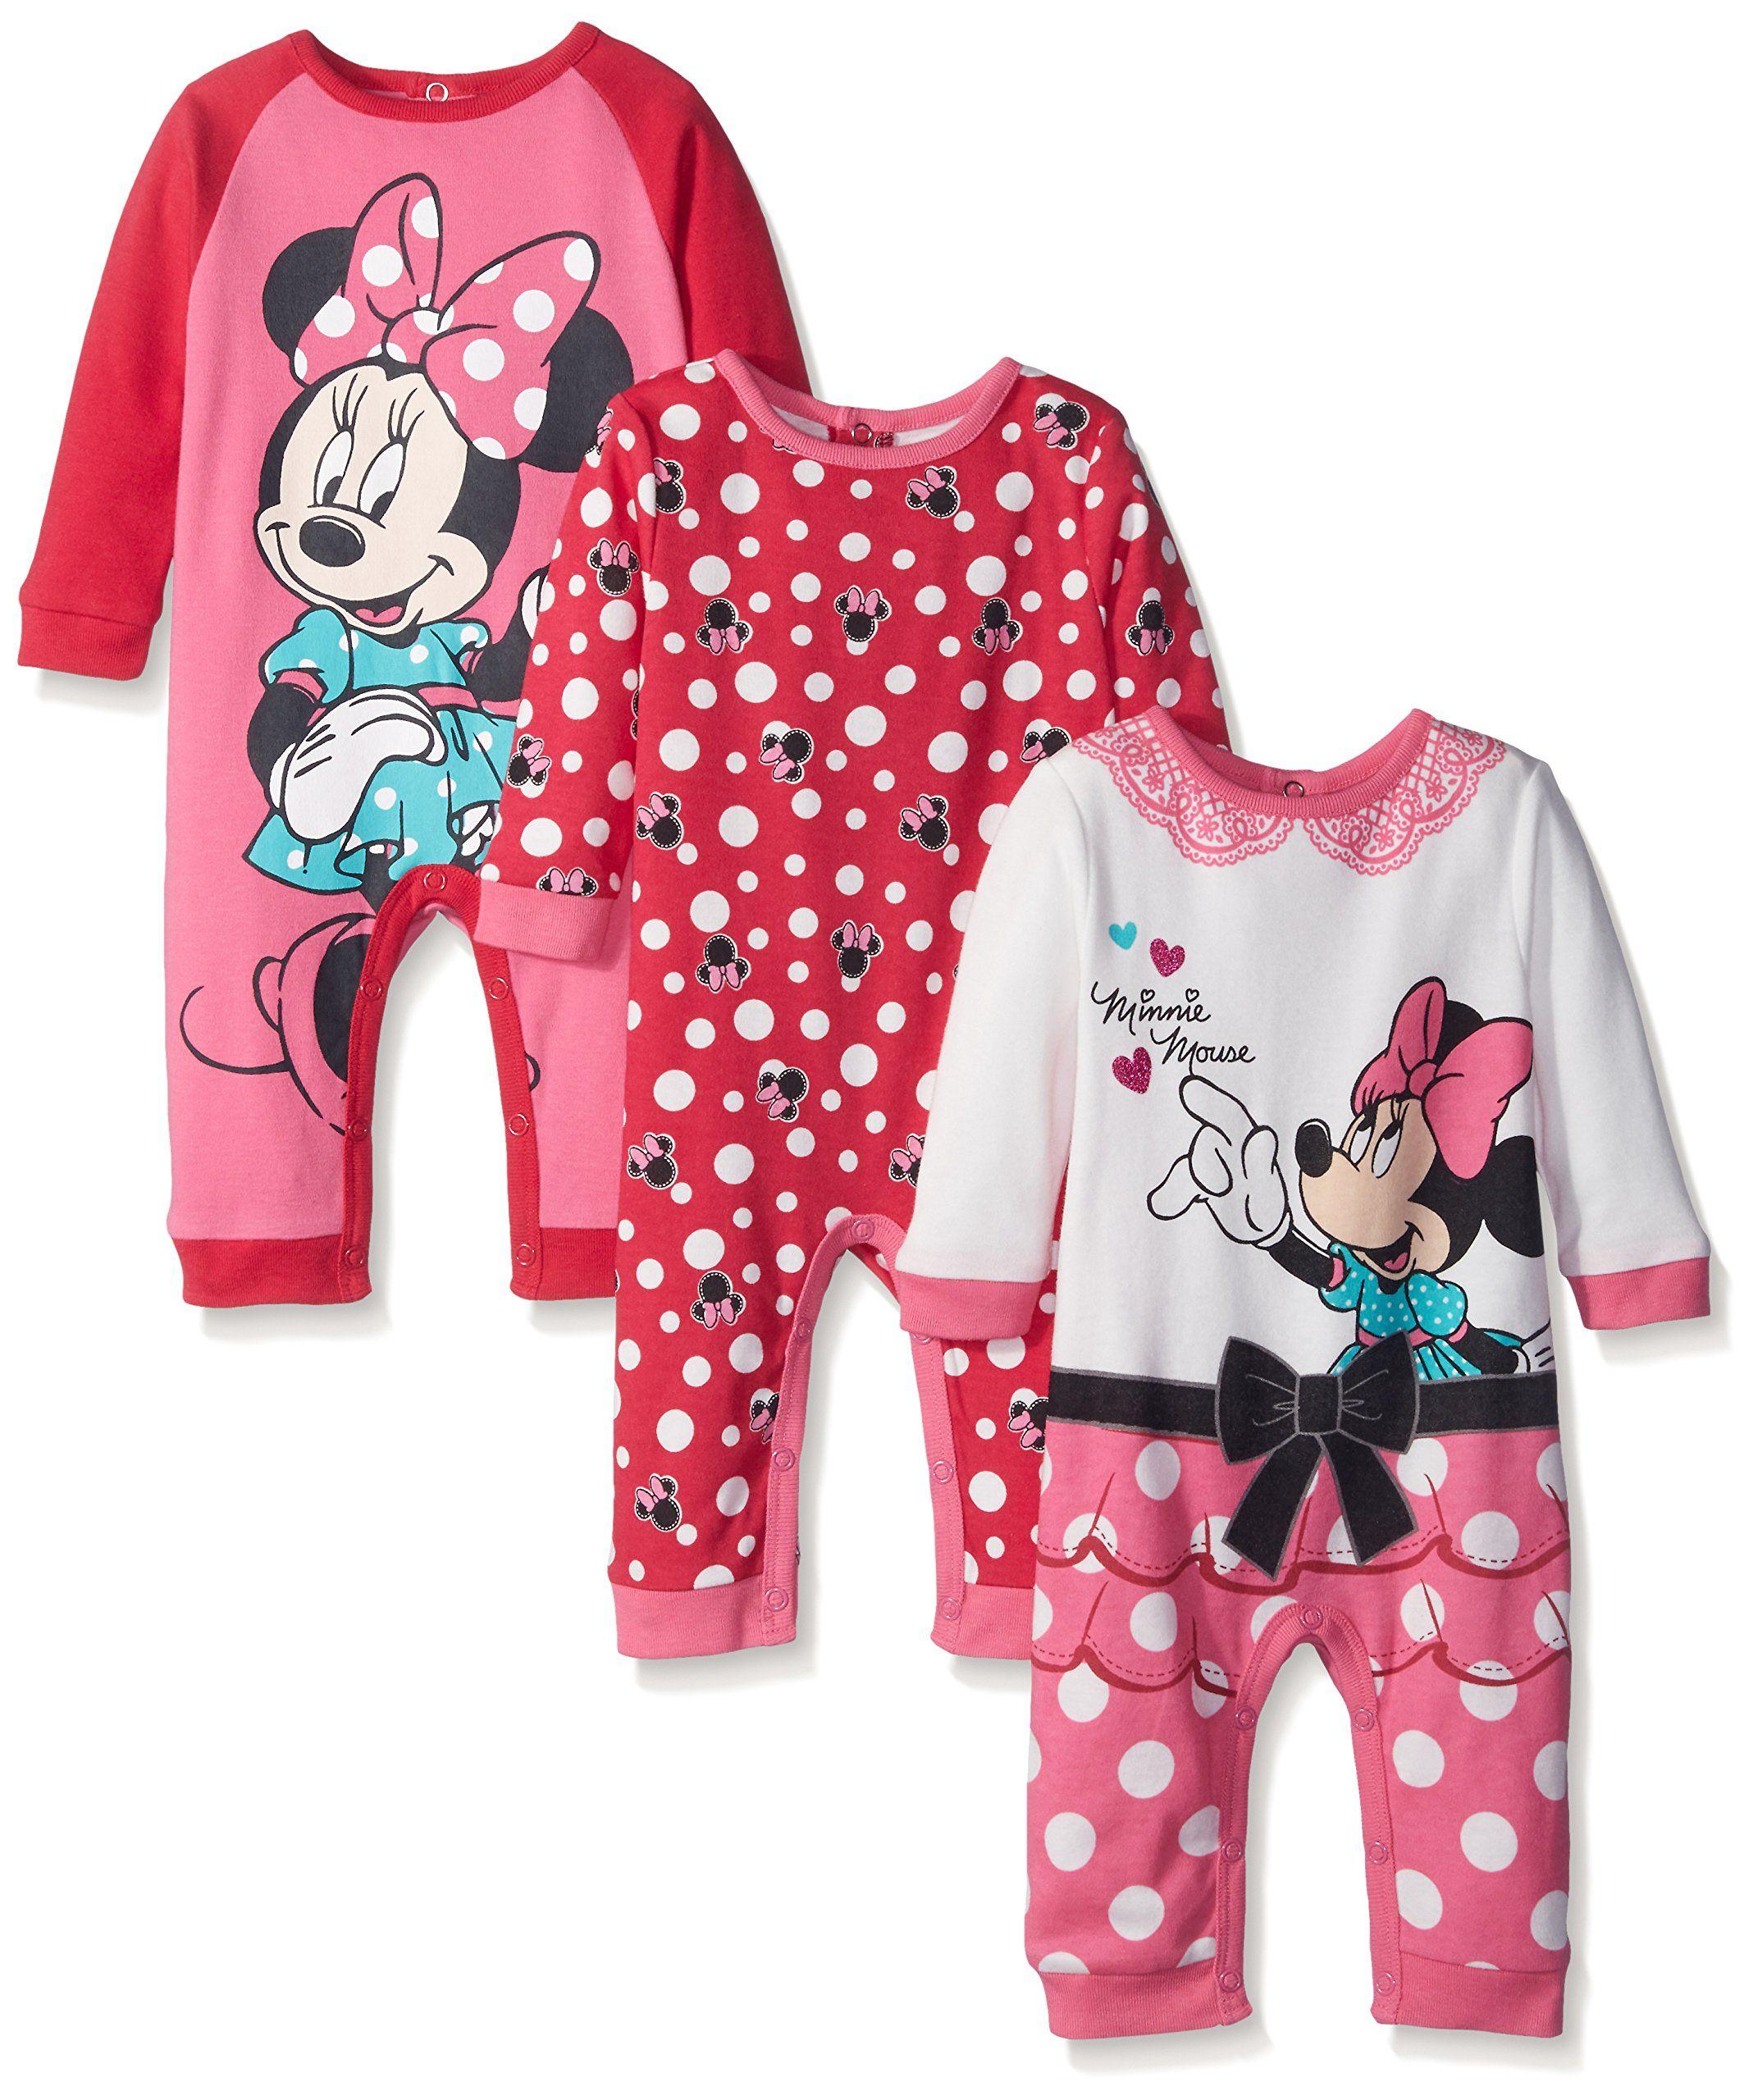 Disney Baby 3 Pack Minnie Coveralls 2c6f9f12e